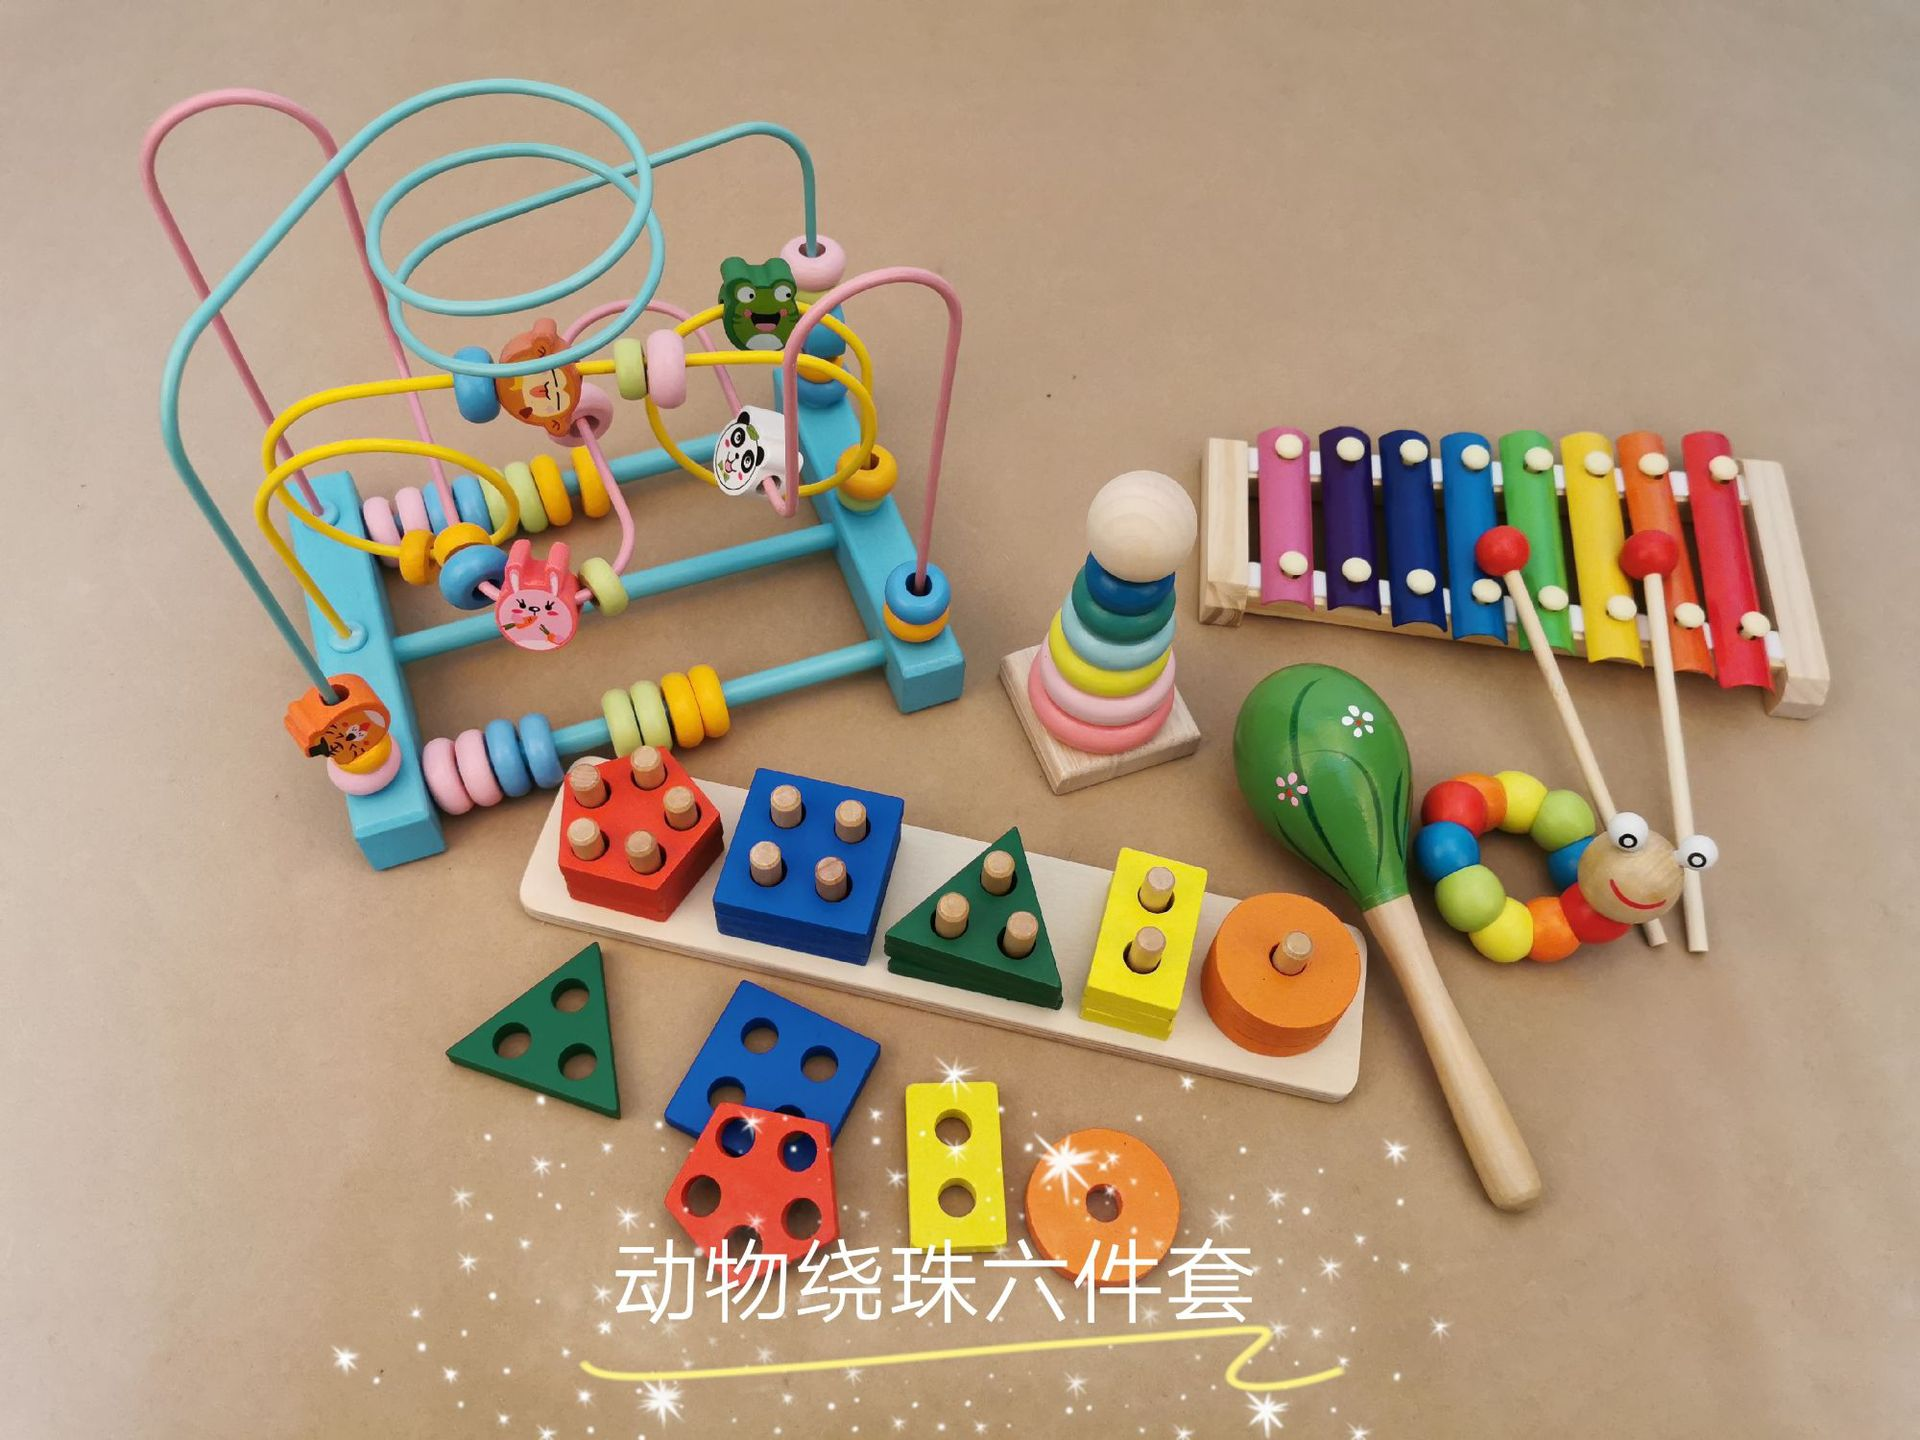 Wooden Animal Fruit Bead-stringing Toy Six Pieces Set Building Blocks Shape Five Column Beaded Bracelet Clock Sand Hammer Knock